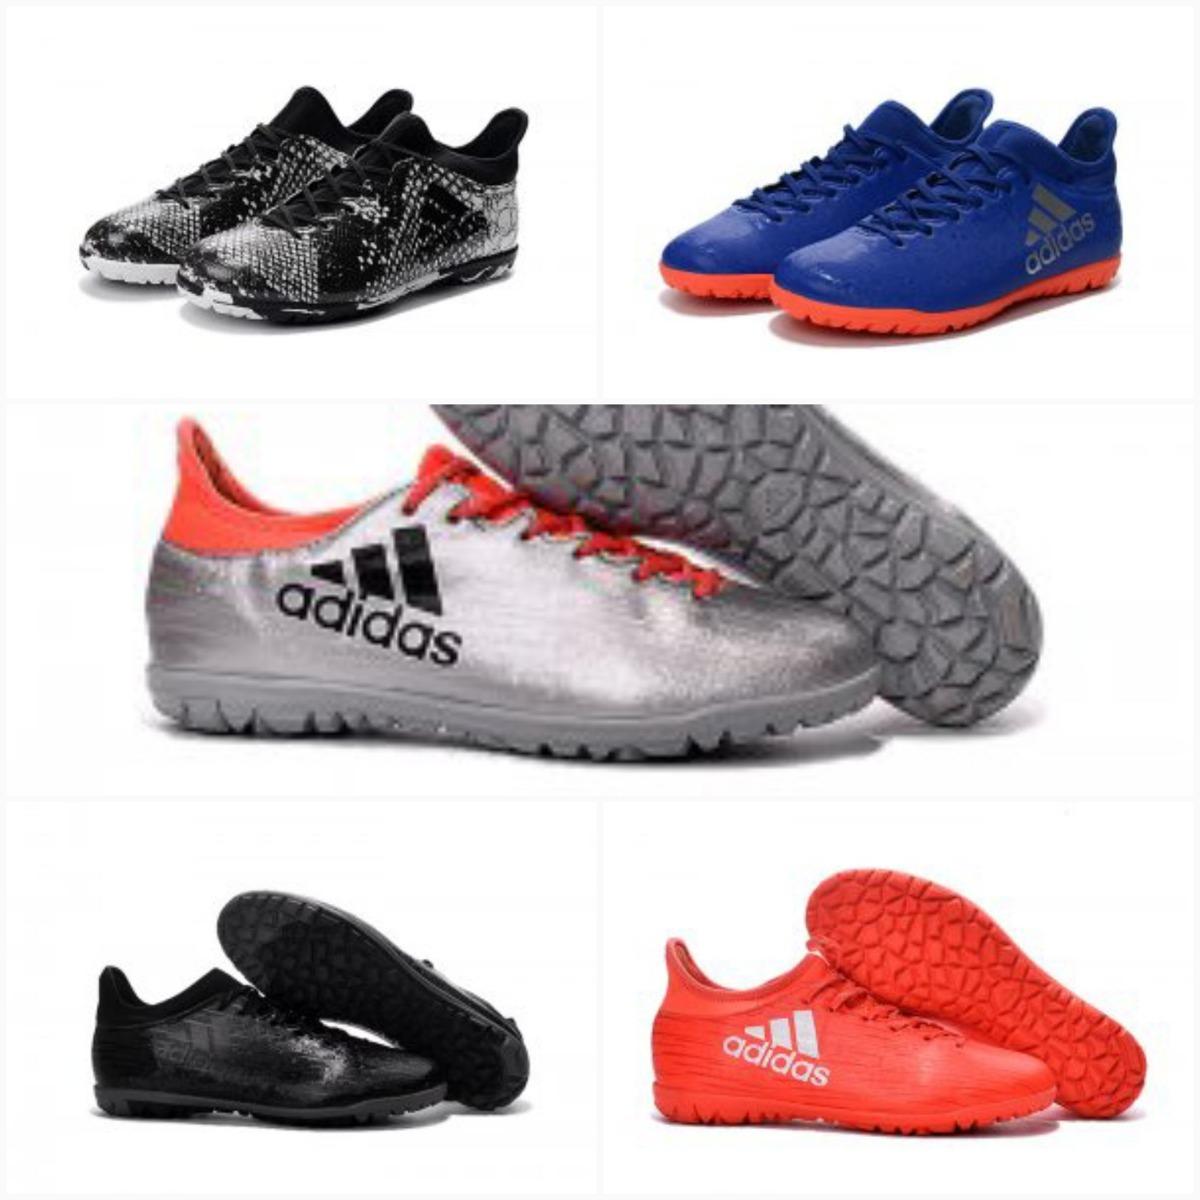 6dce50704f4ea botines futbol 5 nike adidas - talle 43. Cargando zoom.